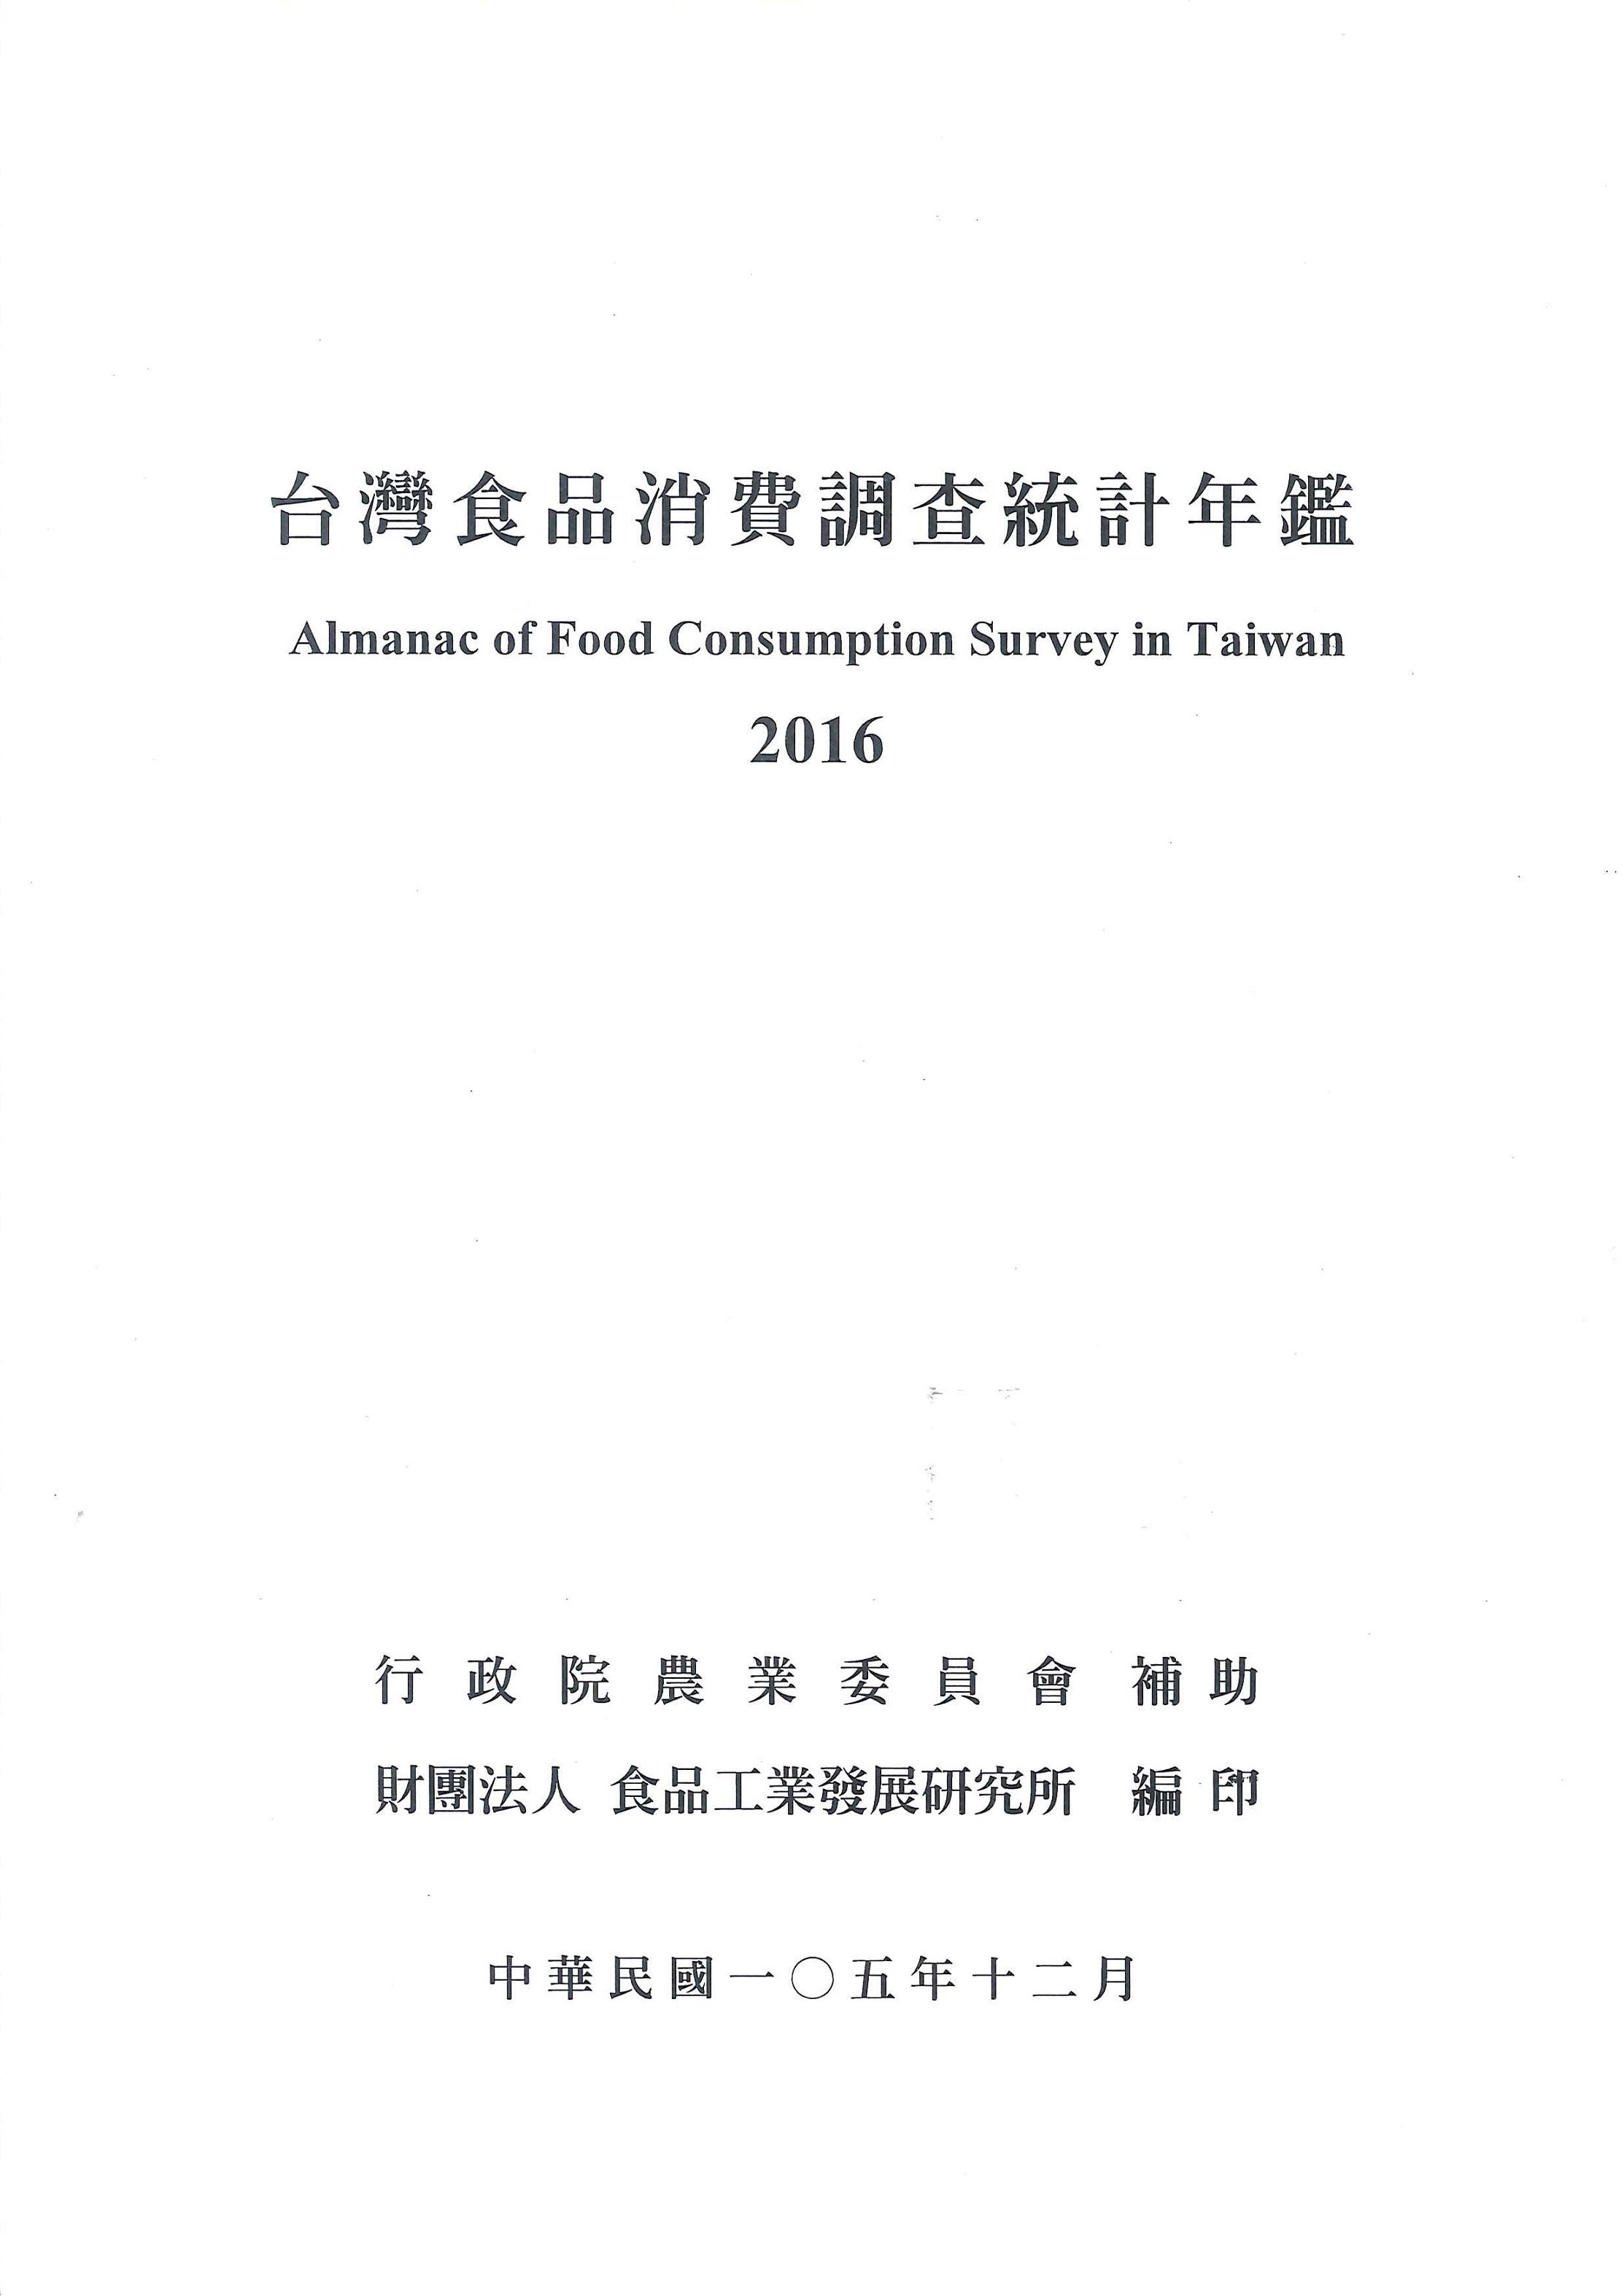 台灣食品消費調查統計年鑑=Almanac of food consumption survey in Taiwan